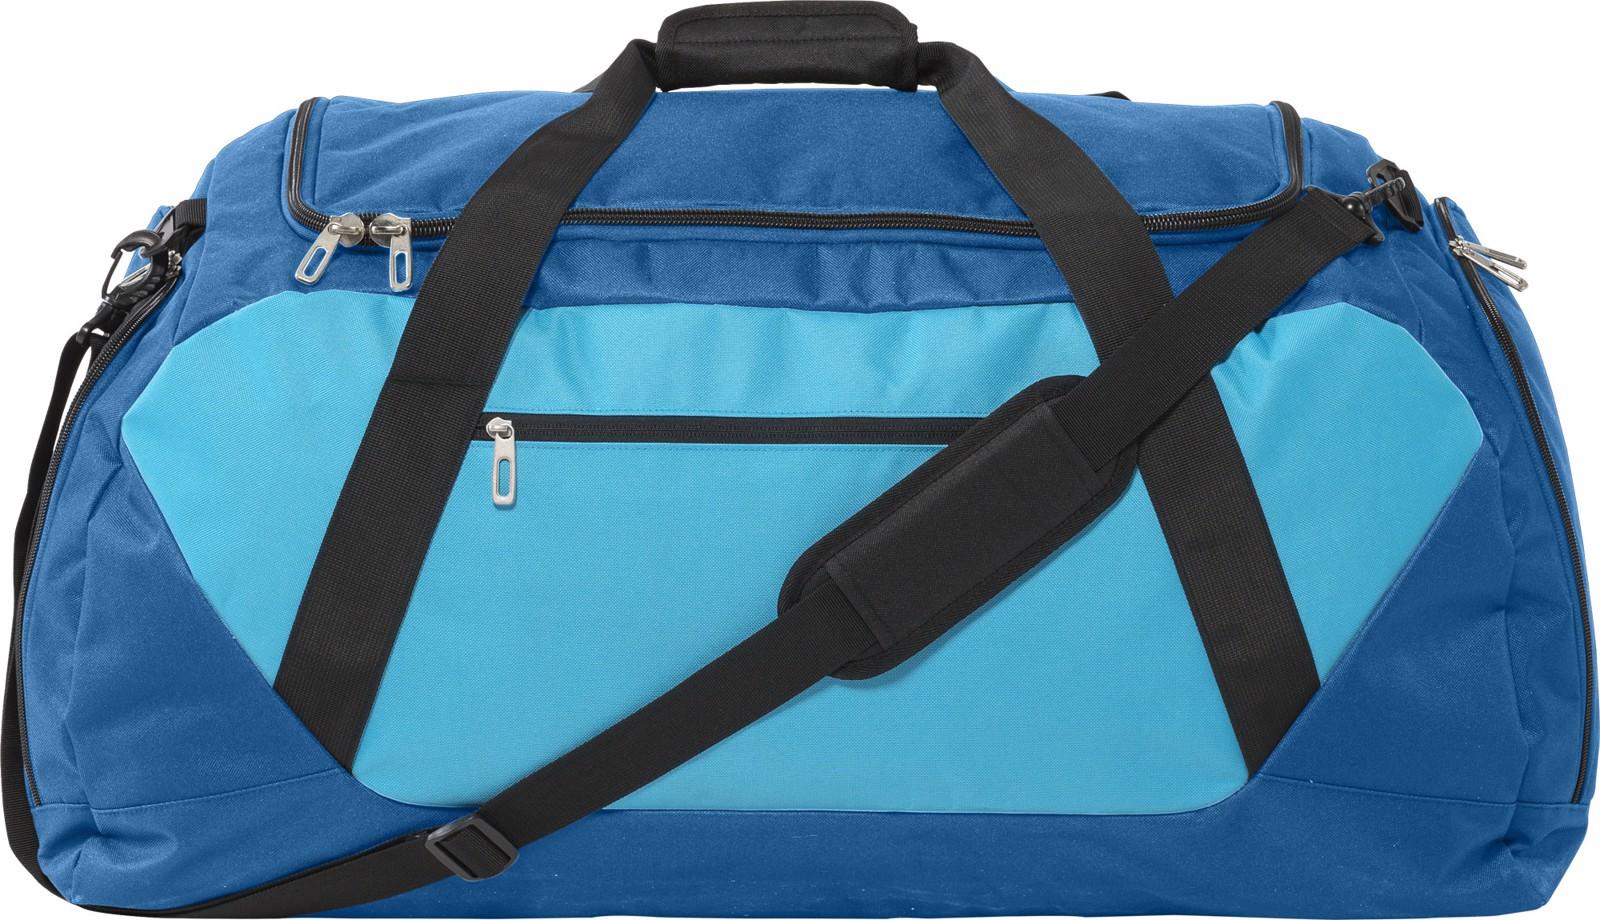 Polyester (600D) sports bag - Dark Blue / Light Blue